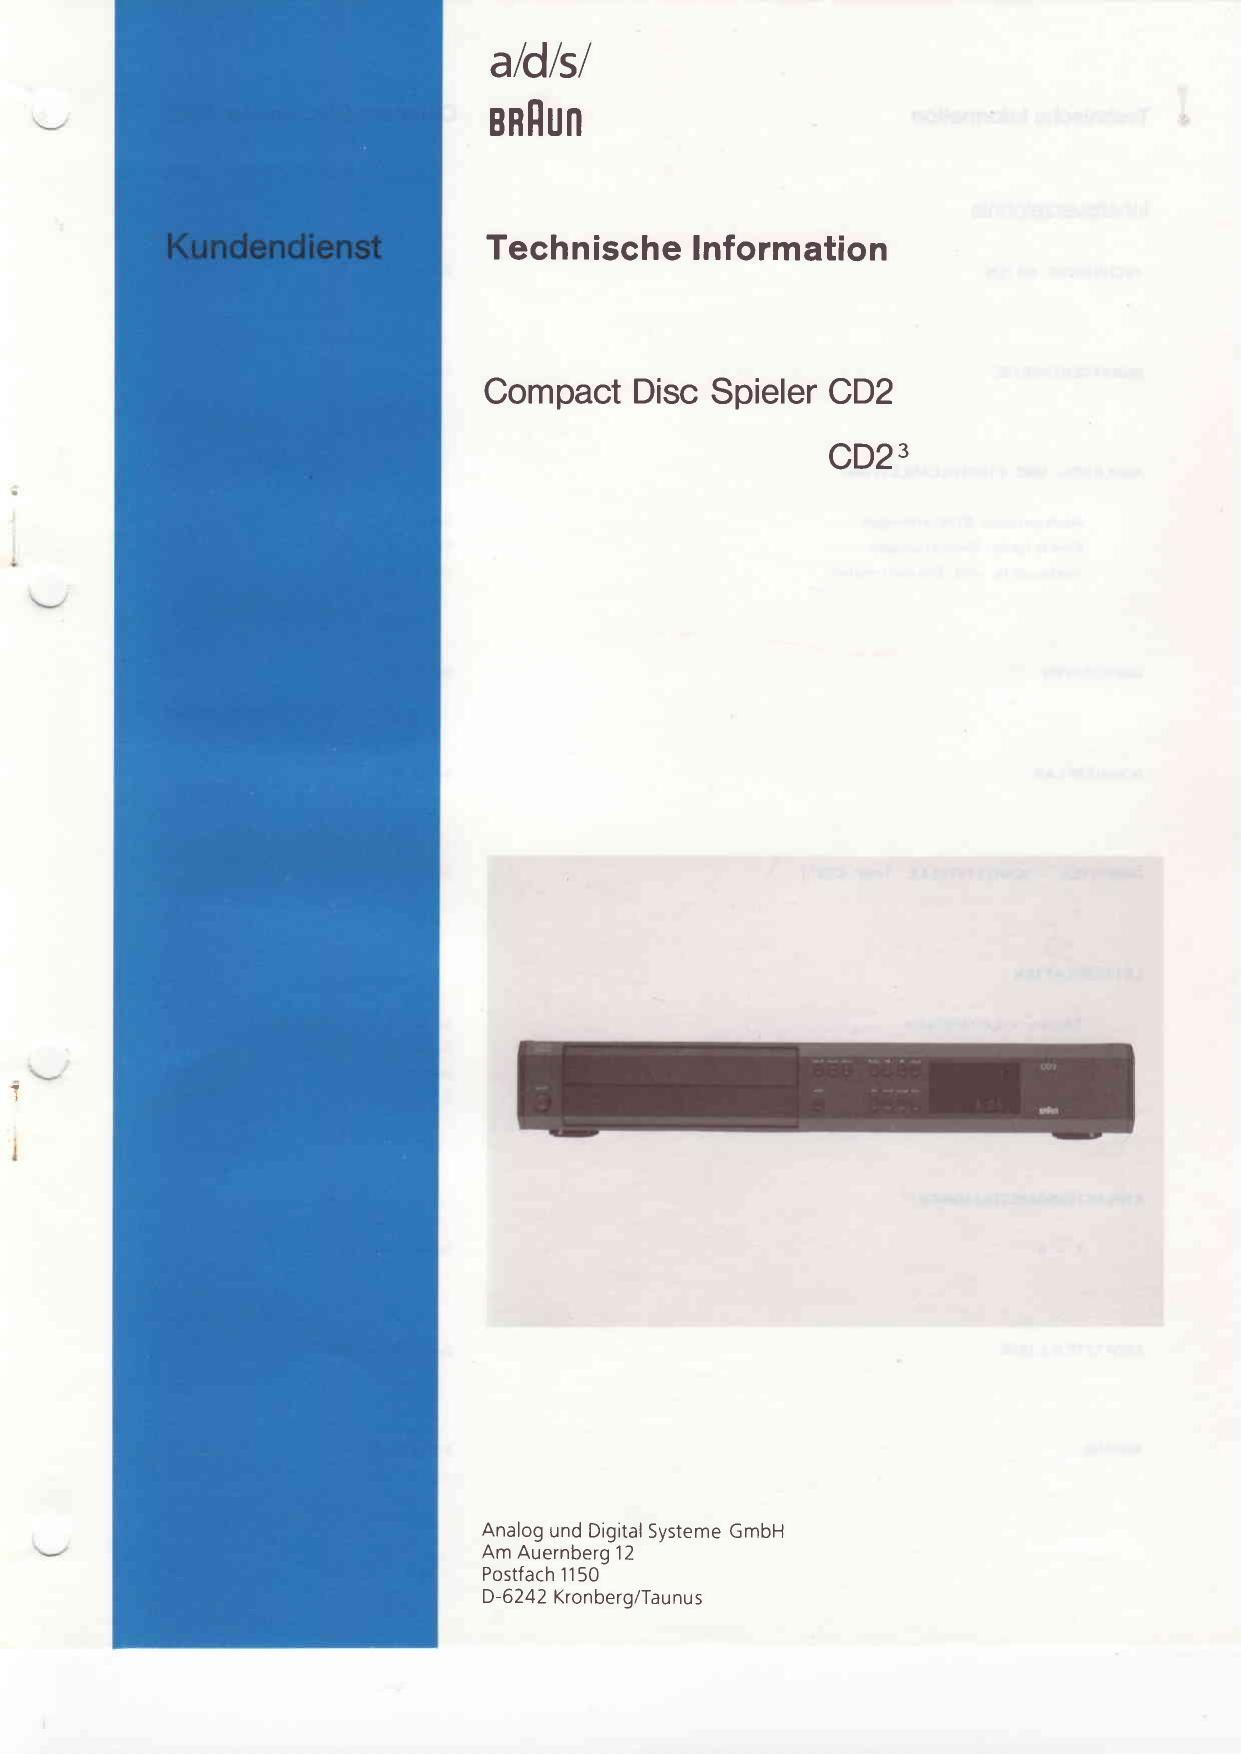 braun cd 2 service manual rh audioservicemanuals com braun 5491 service manual braun 4191 service manual